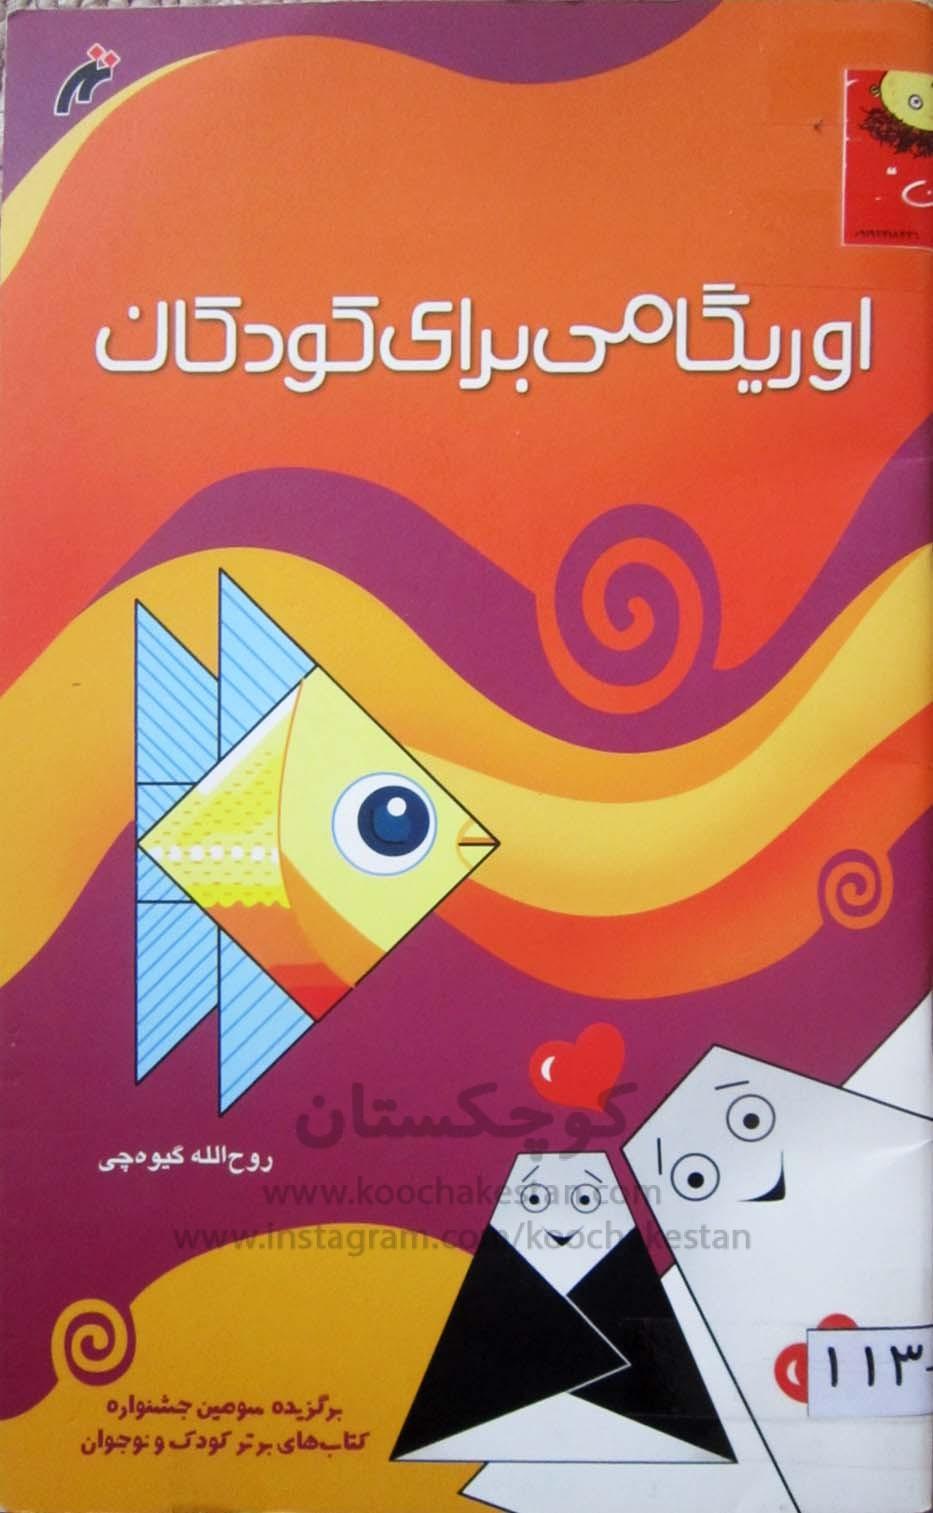 اوریگامی برای کودکان - کتابخانه کودک - کوچکستان